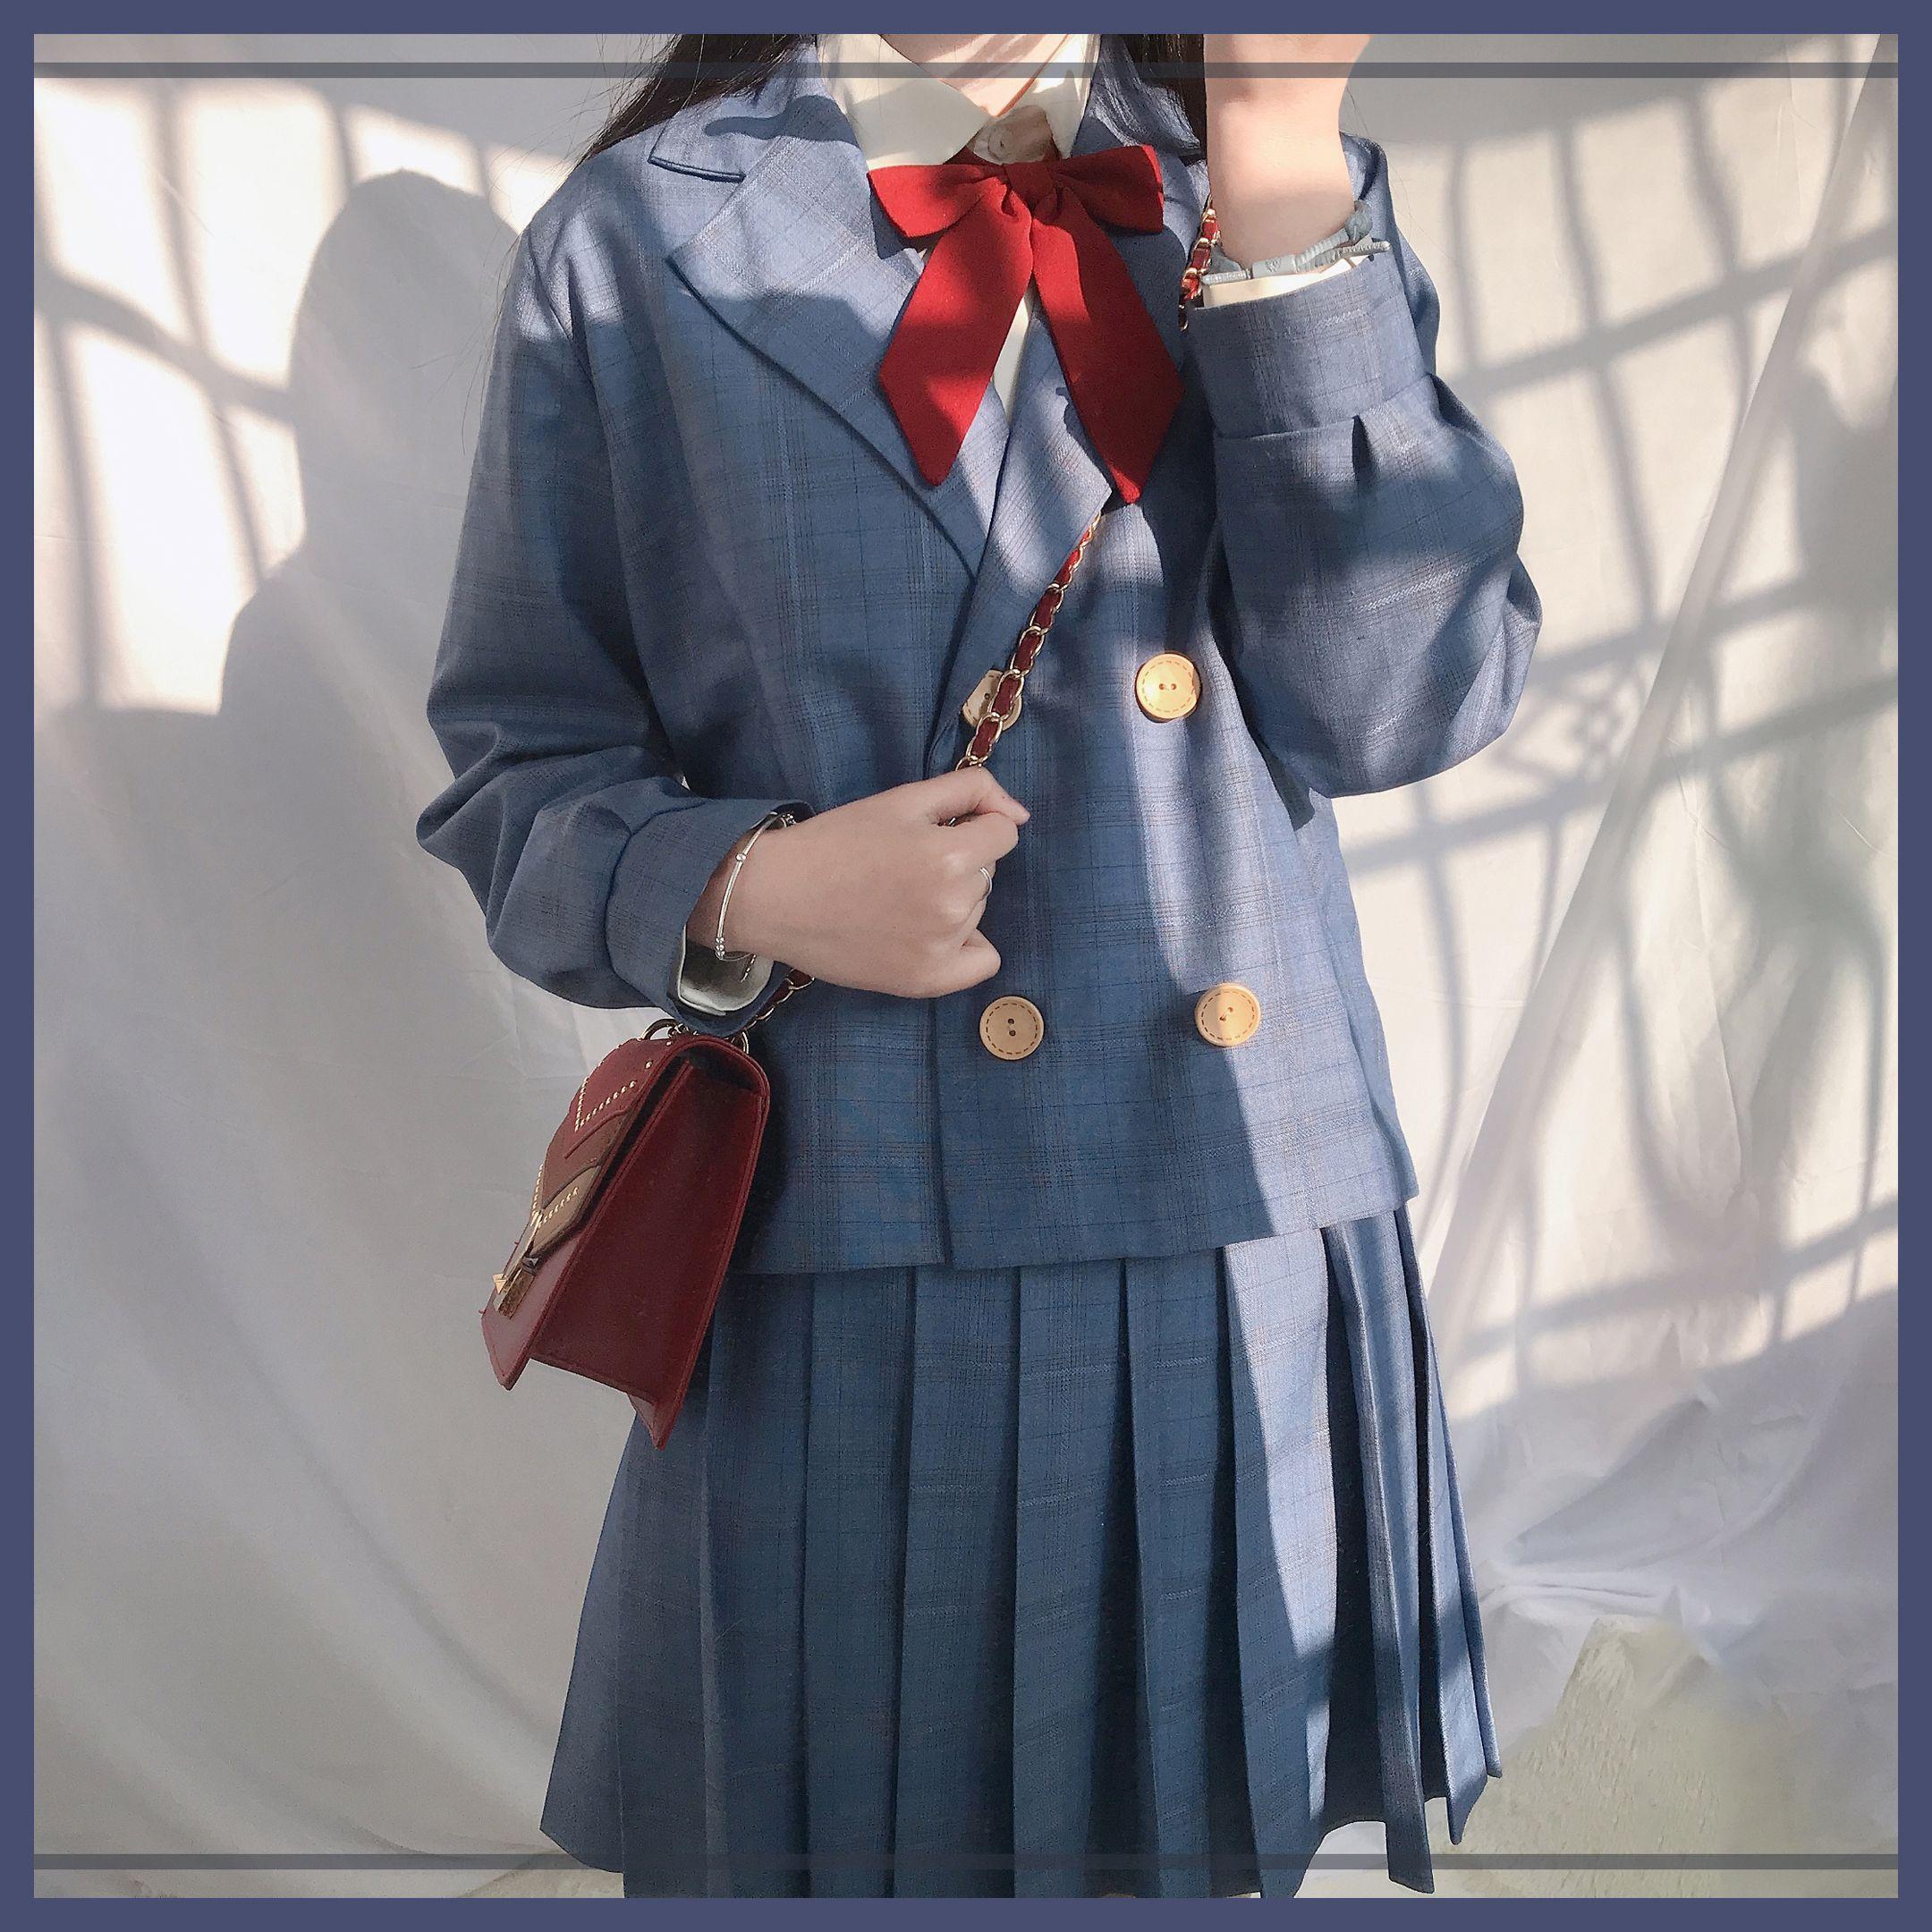 [Plaid] autumn and winter top students Grey Blue Plaid retro leisure elegant suit, two pieces of quiet temperament